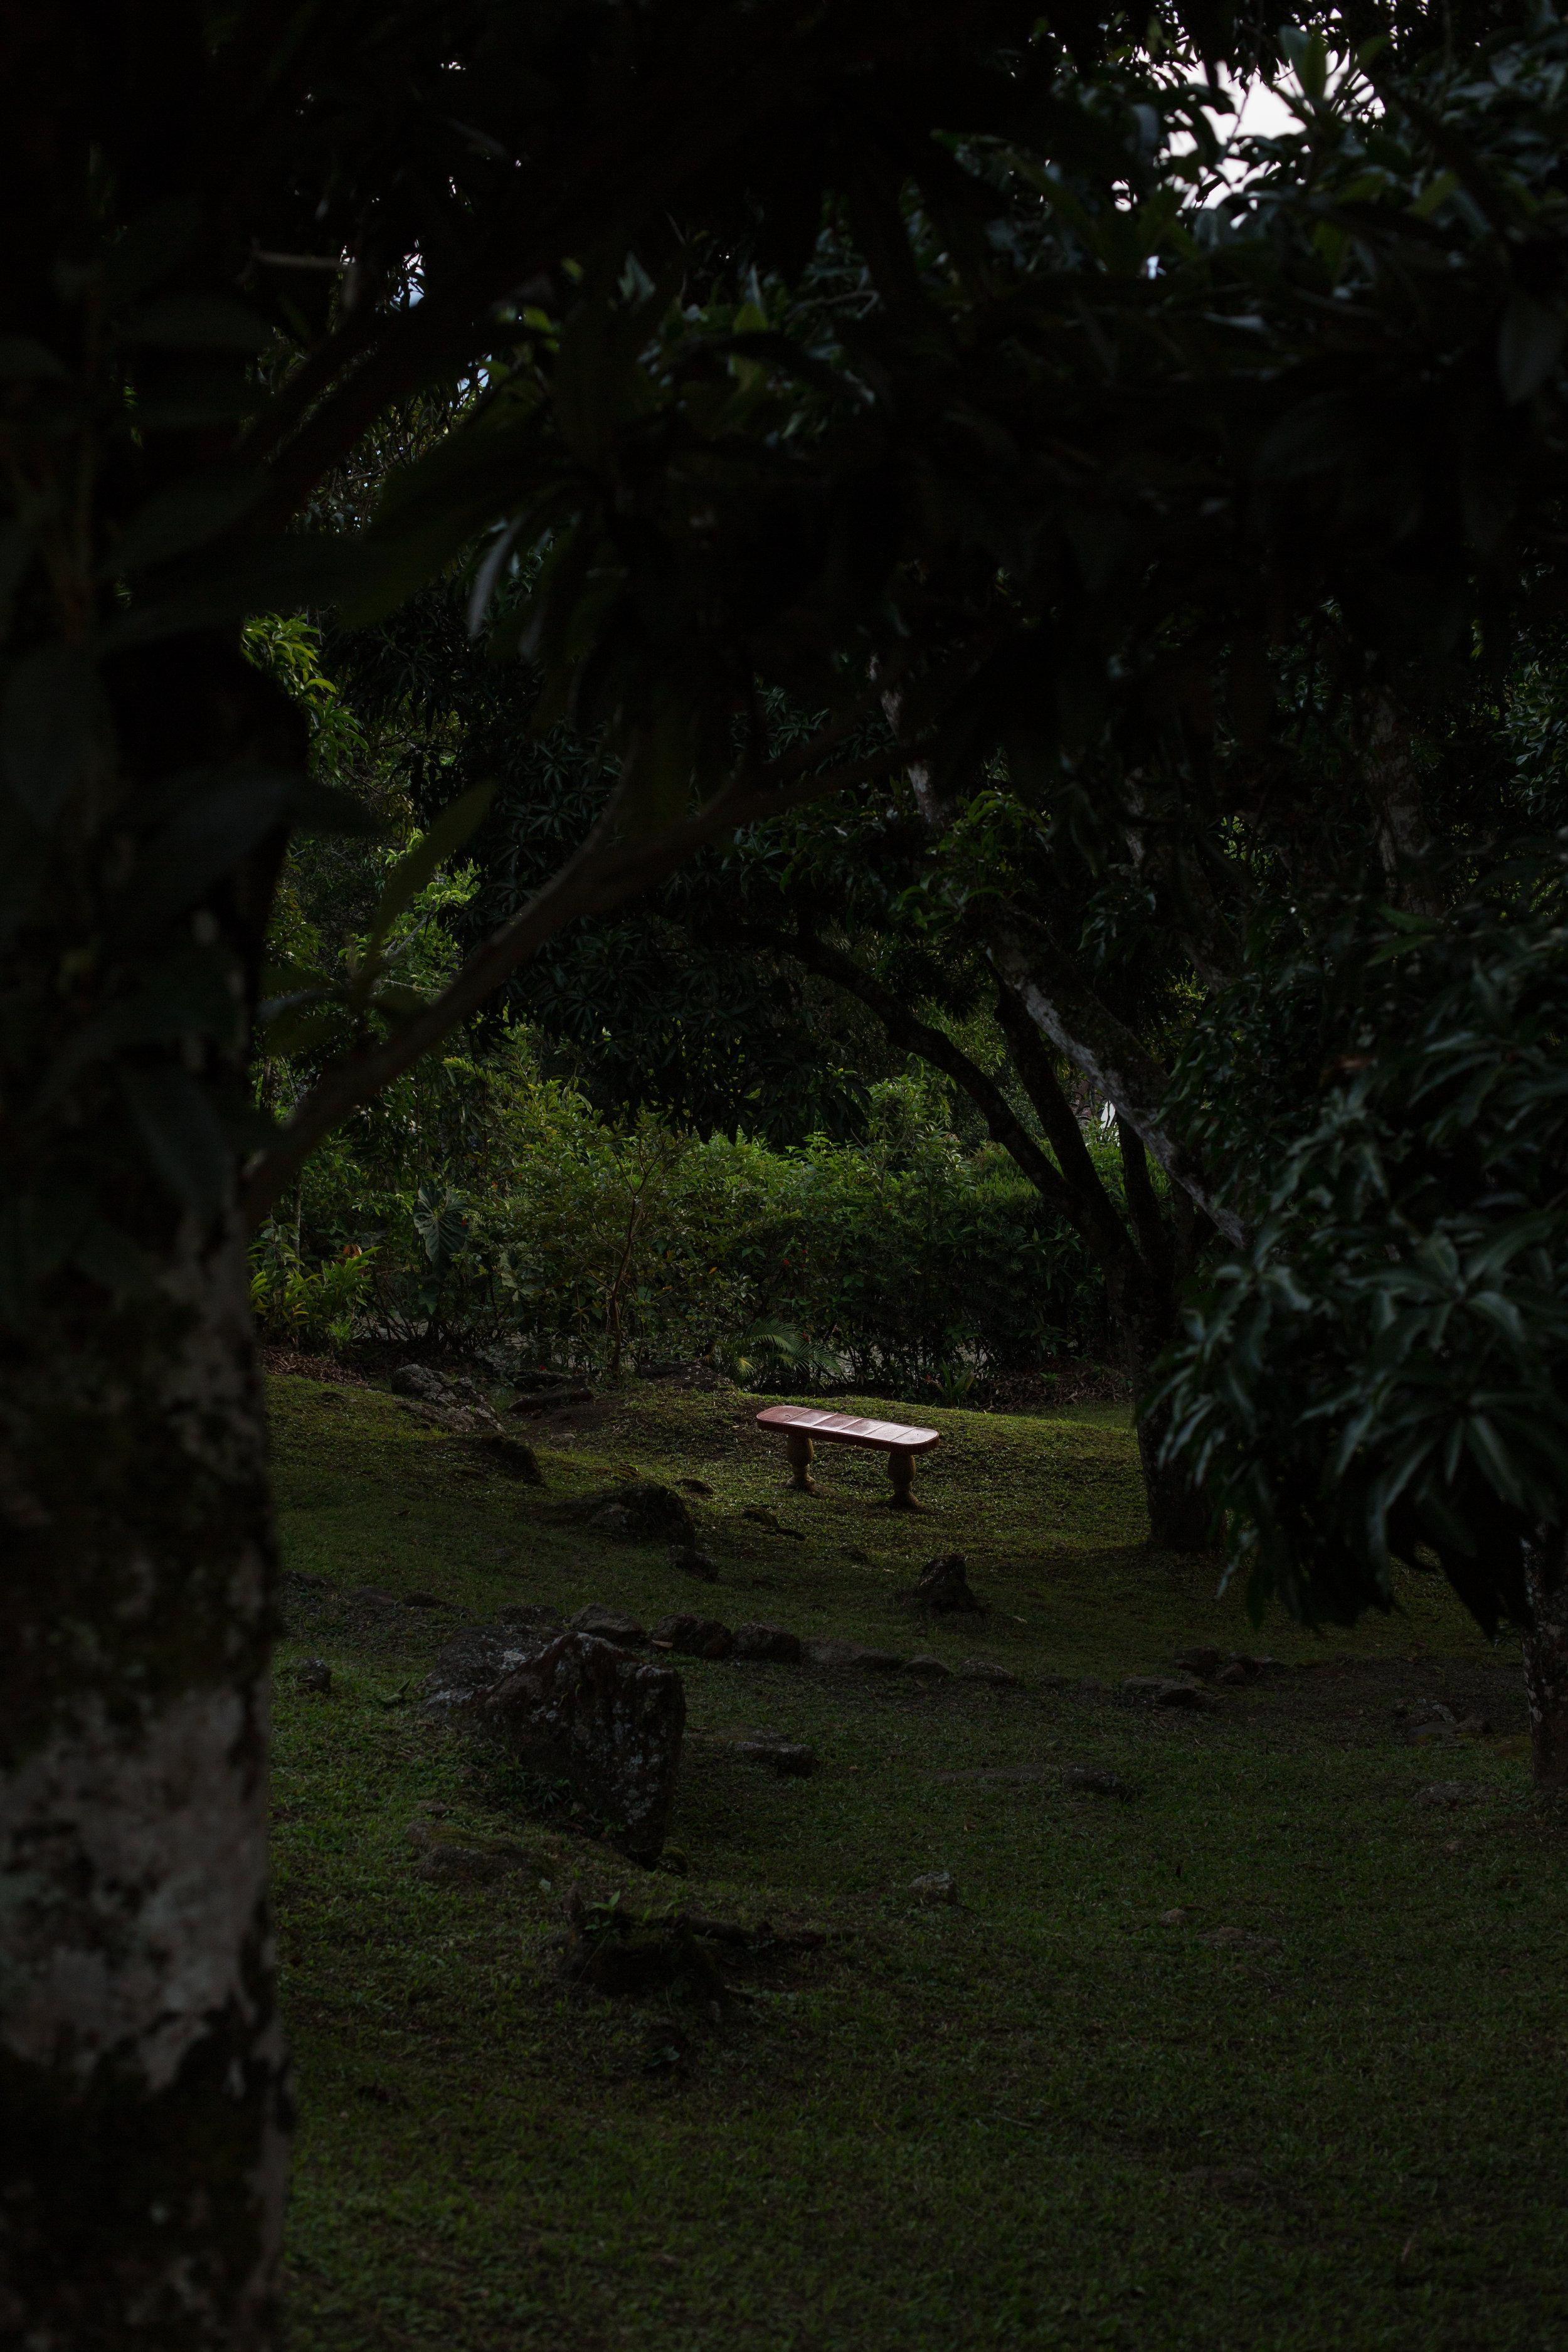 Medellin_LaFinca_2017_6-2.JPG